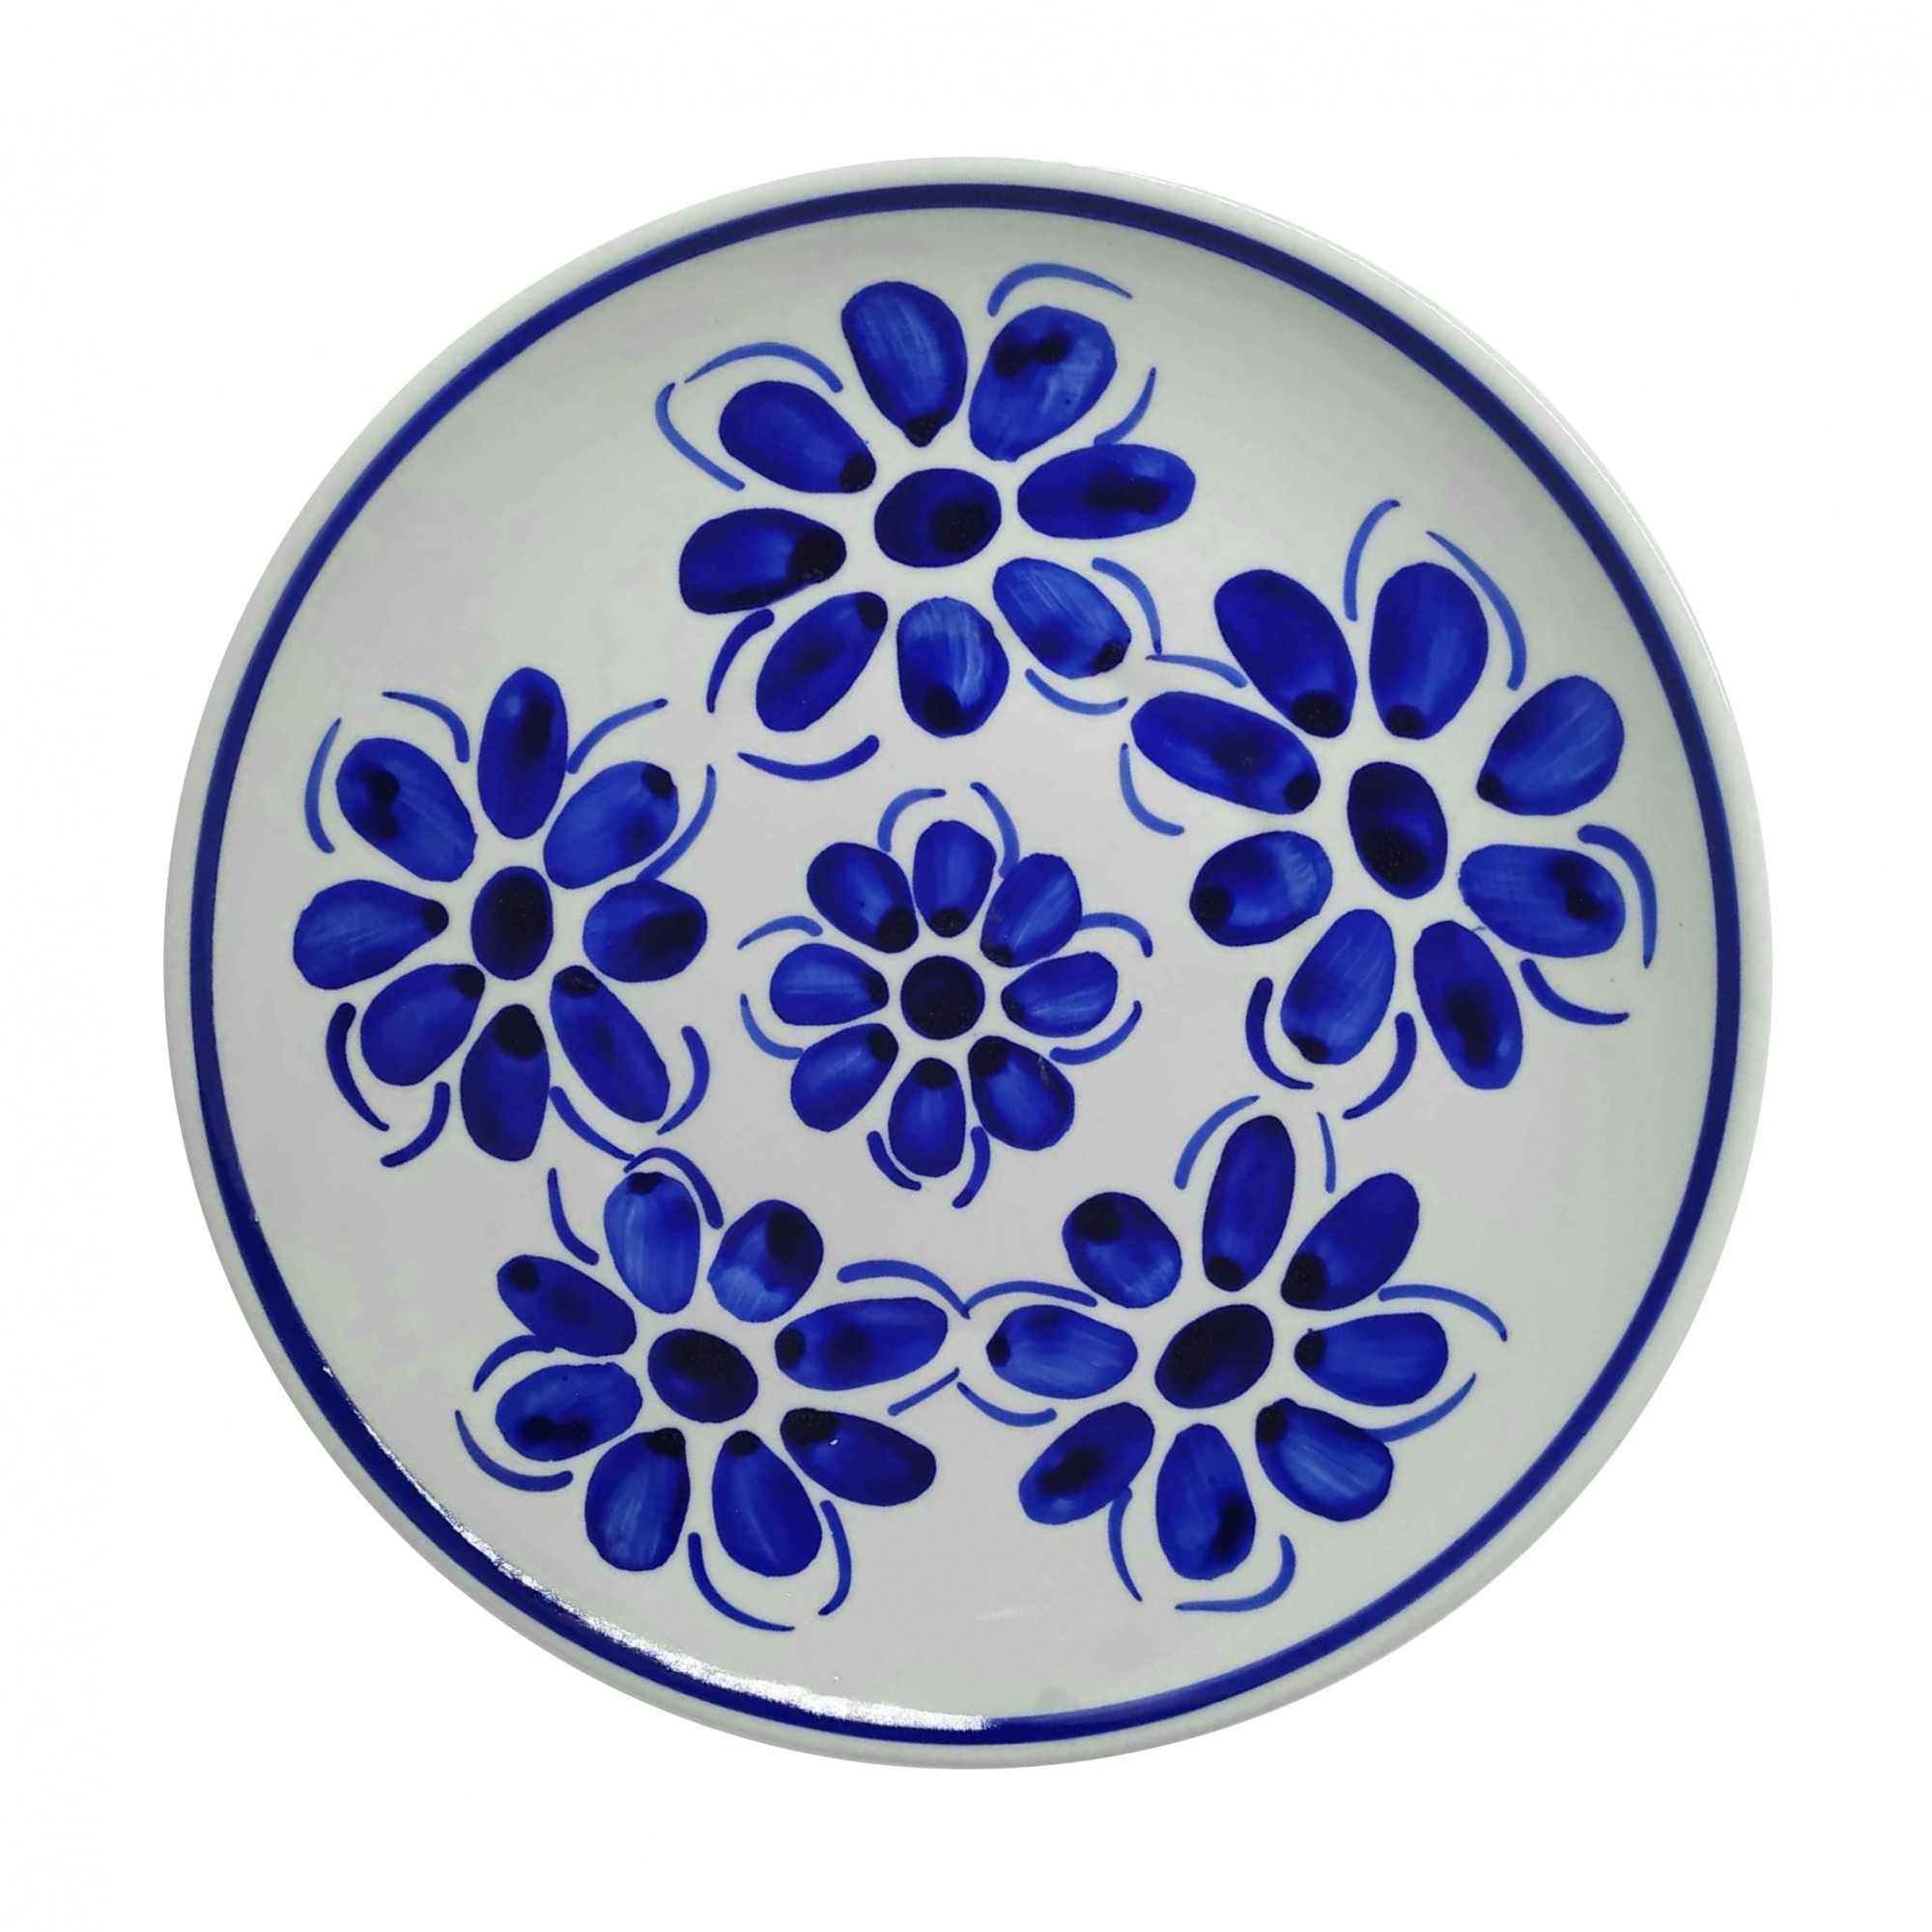 Prato Raso 22,5 cm Porcelana Azul Vintage